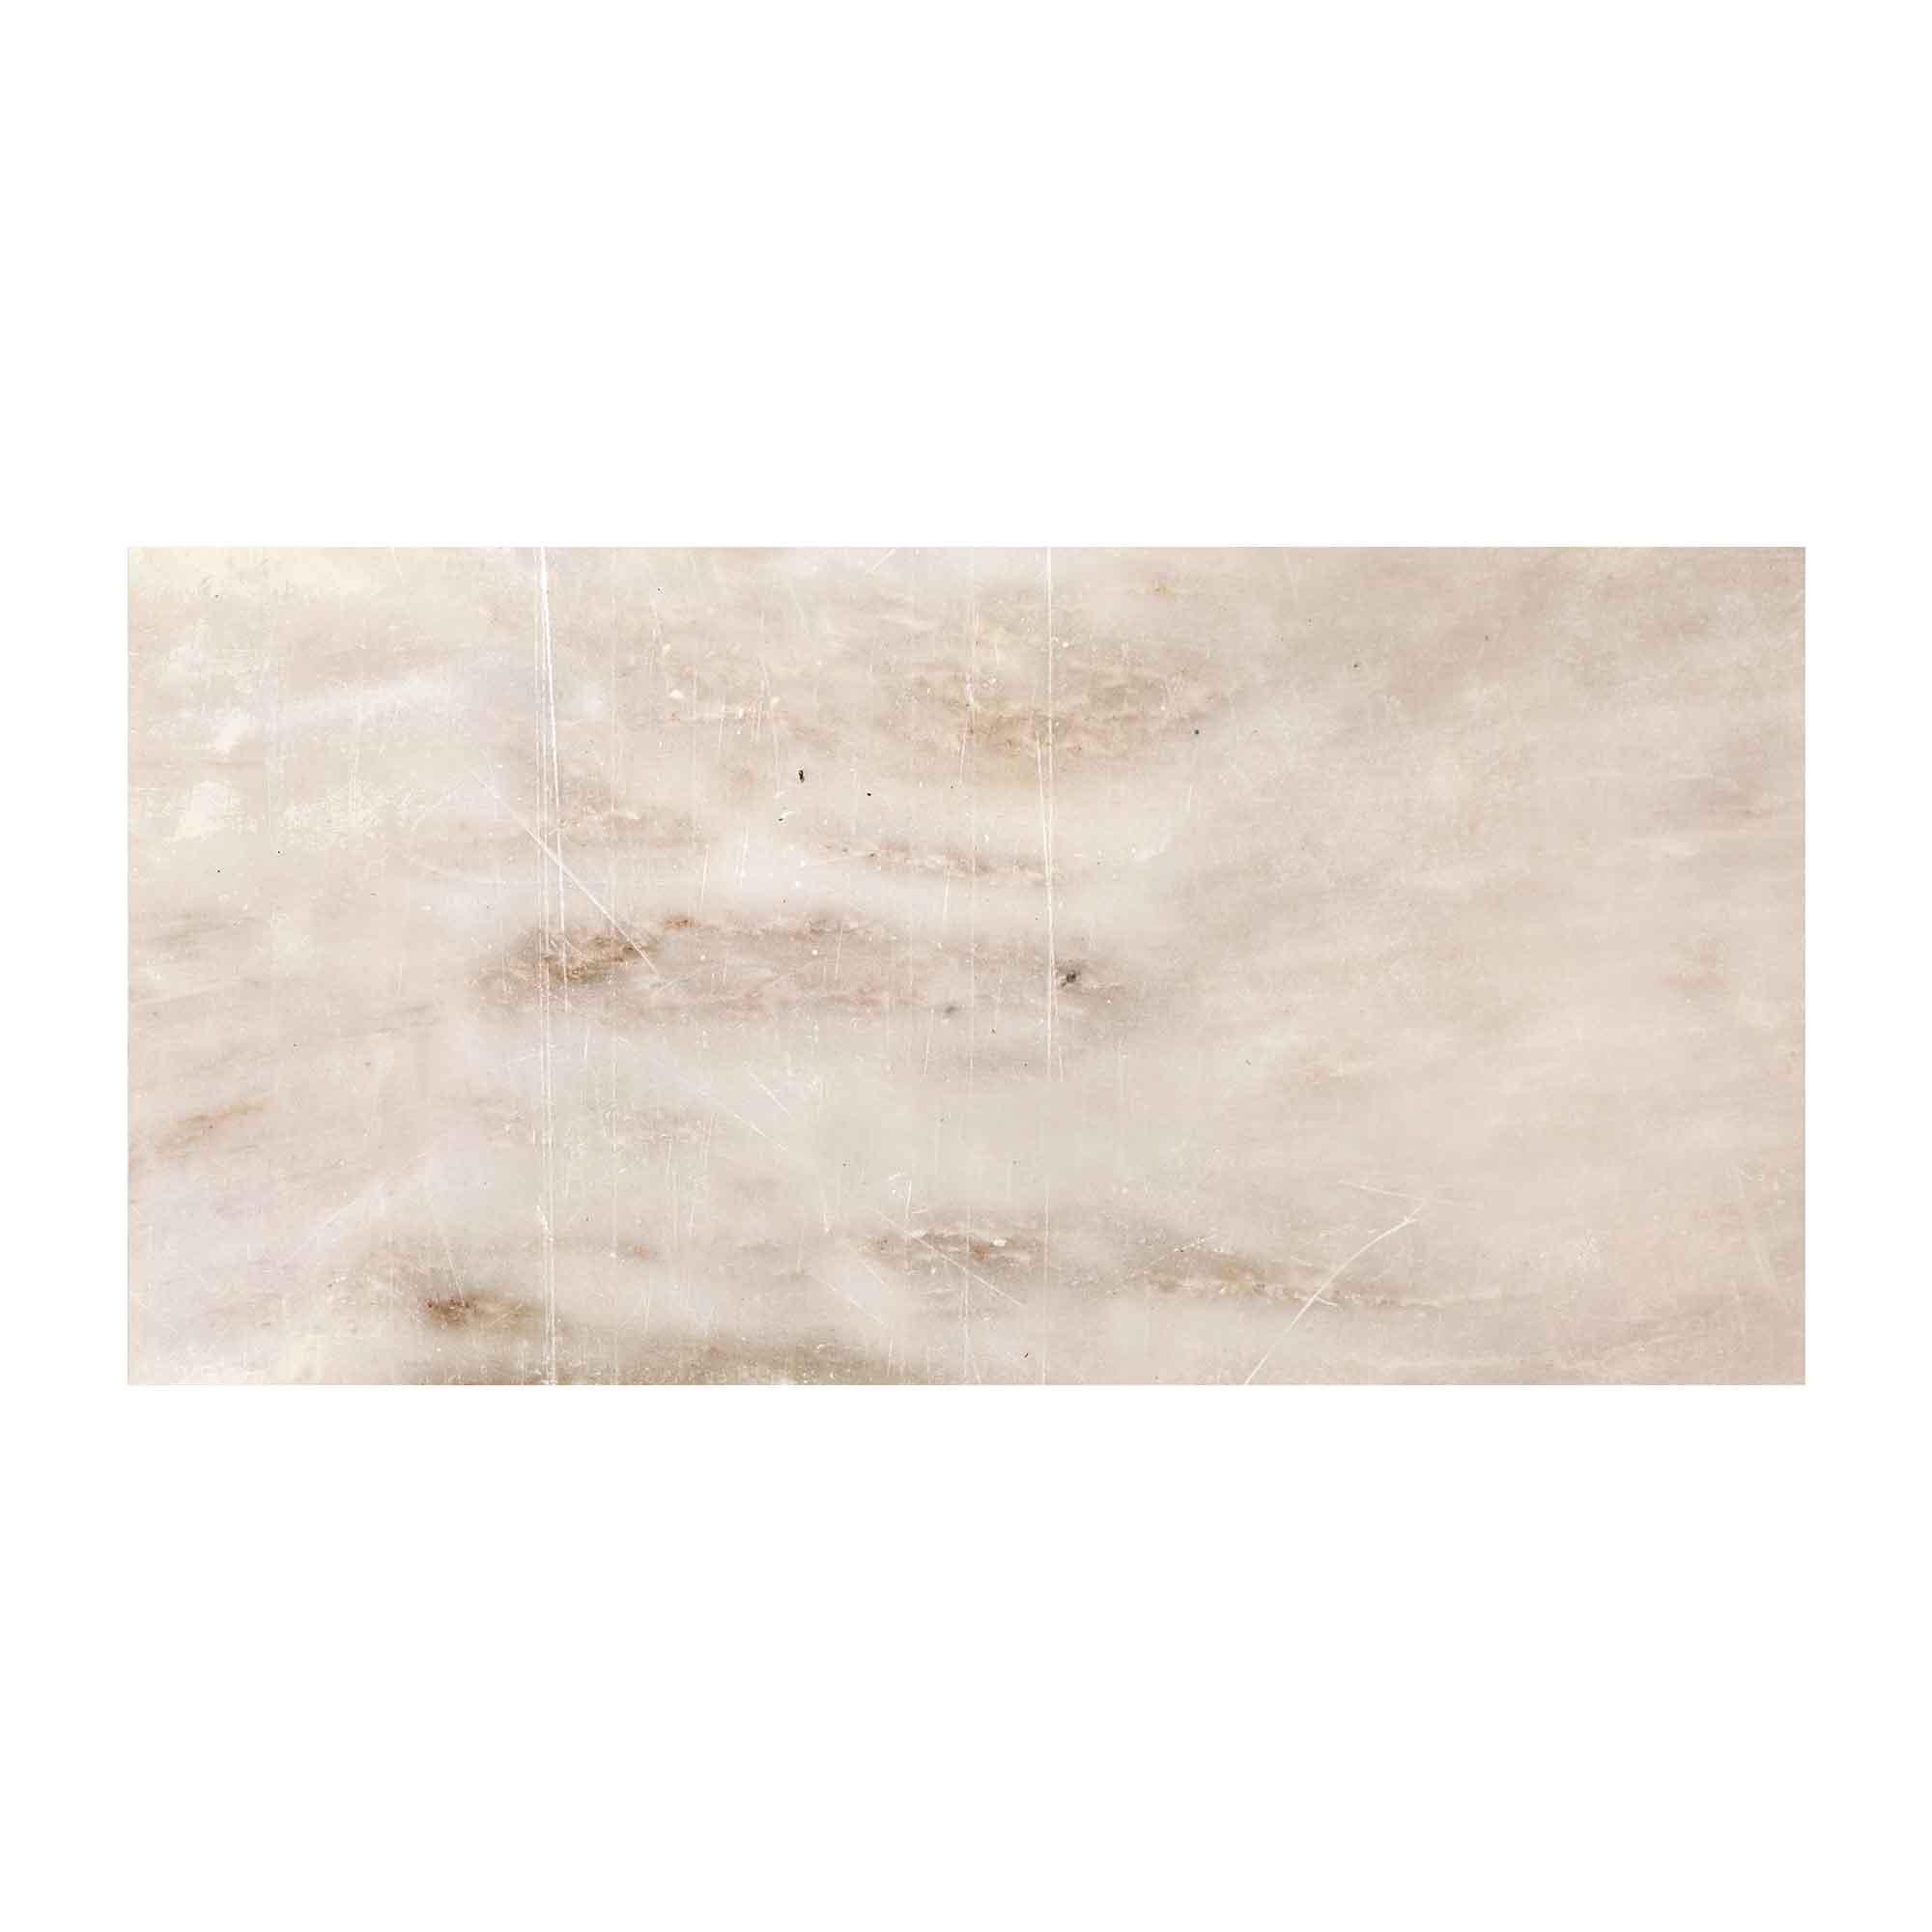 Faianta Cesarom Soft bej, model cu piatra, finisaj lucios, 25 x 50 cm imagine MatHaus.ro